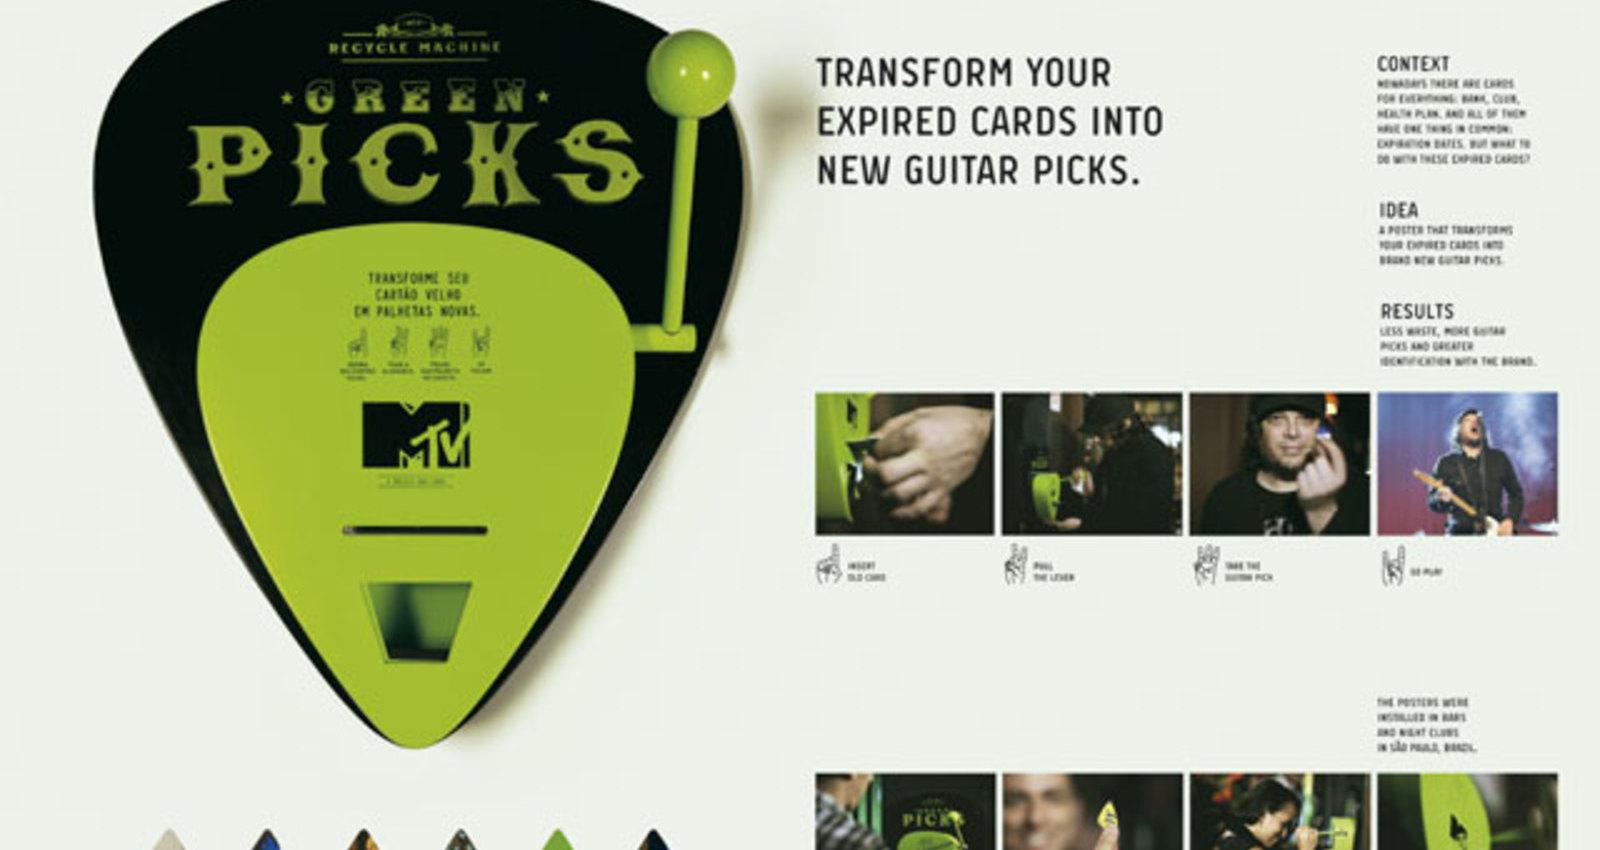 Green Picks